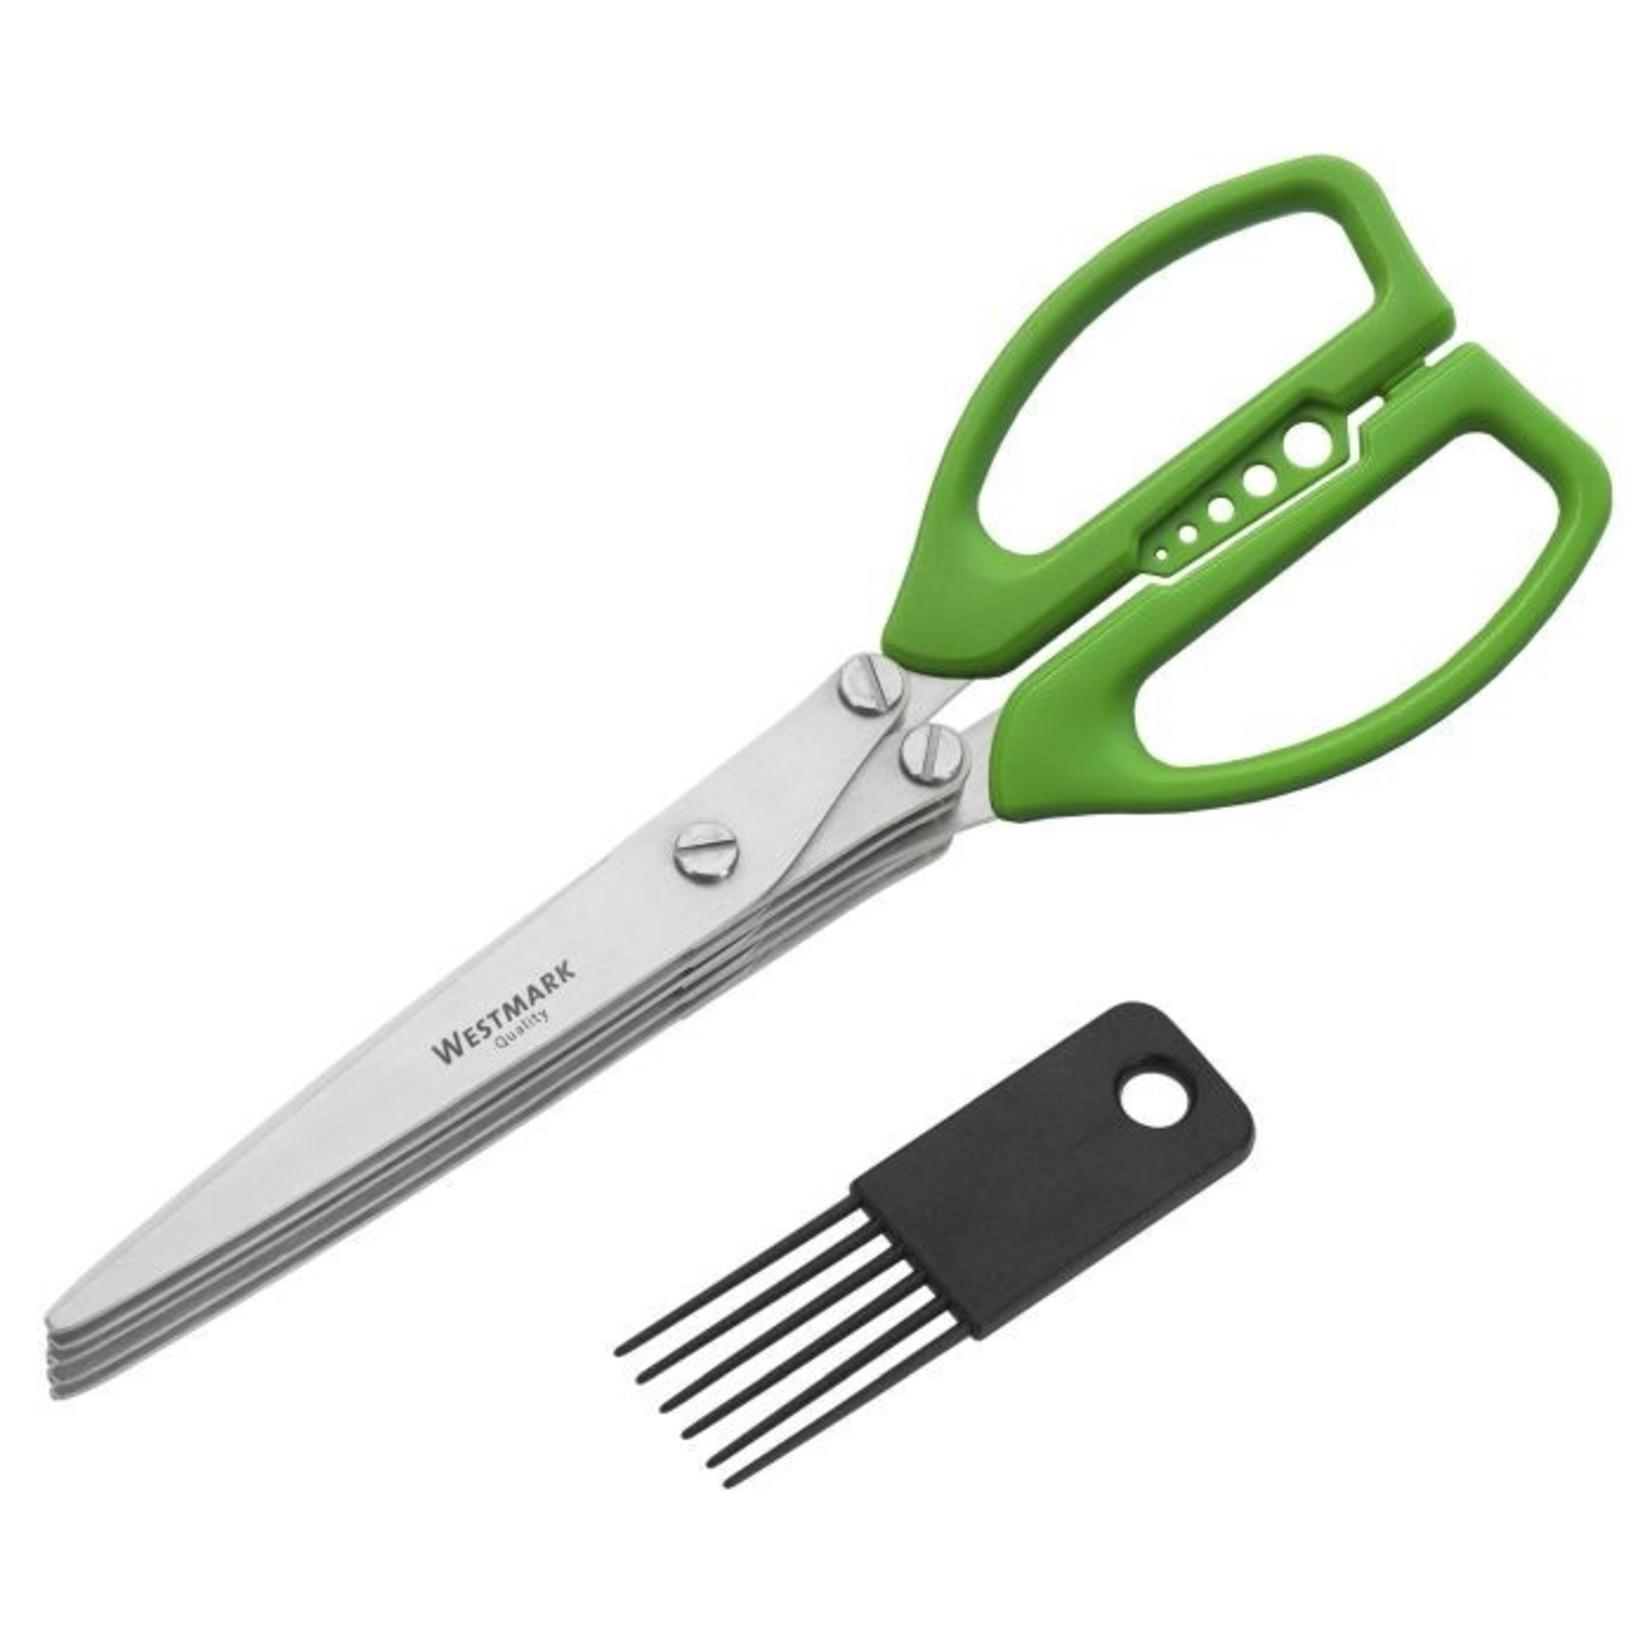 Westmark Herb Scissors